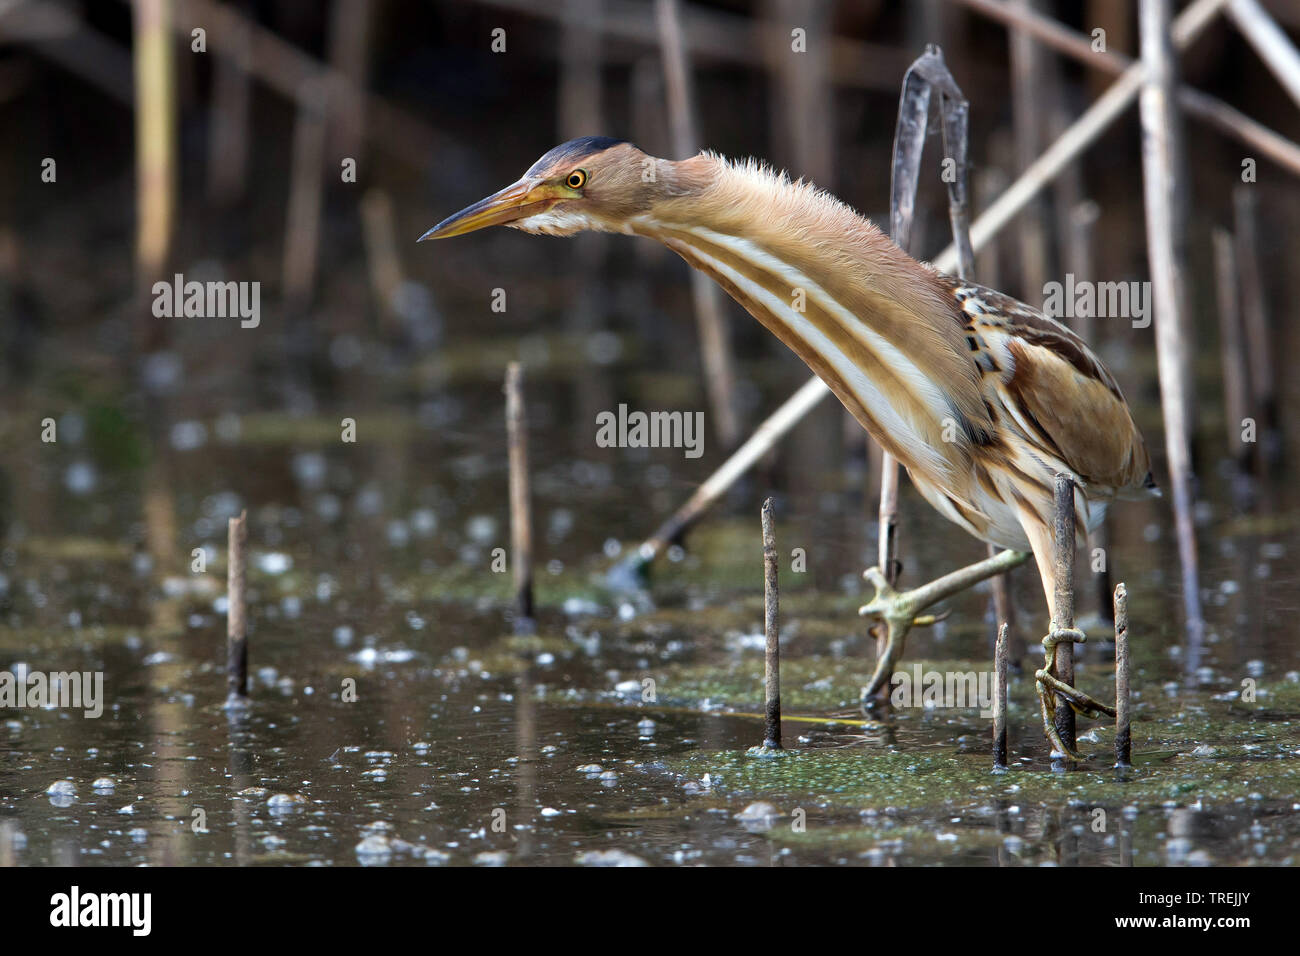 Zwergdommel, Zwerg-Dommel, Zwergrohrdommel, Zwerg-Rohrdommel (Ixobrychus minutus), lauernd im Schilfroehricht, Italien | Little bittern (Ixobrychus mi - Stock Image